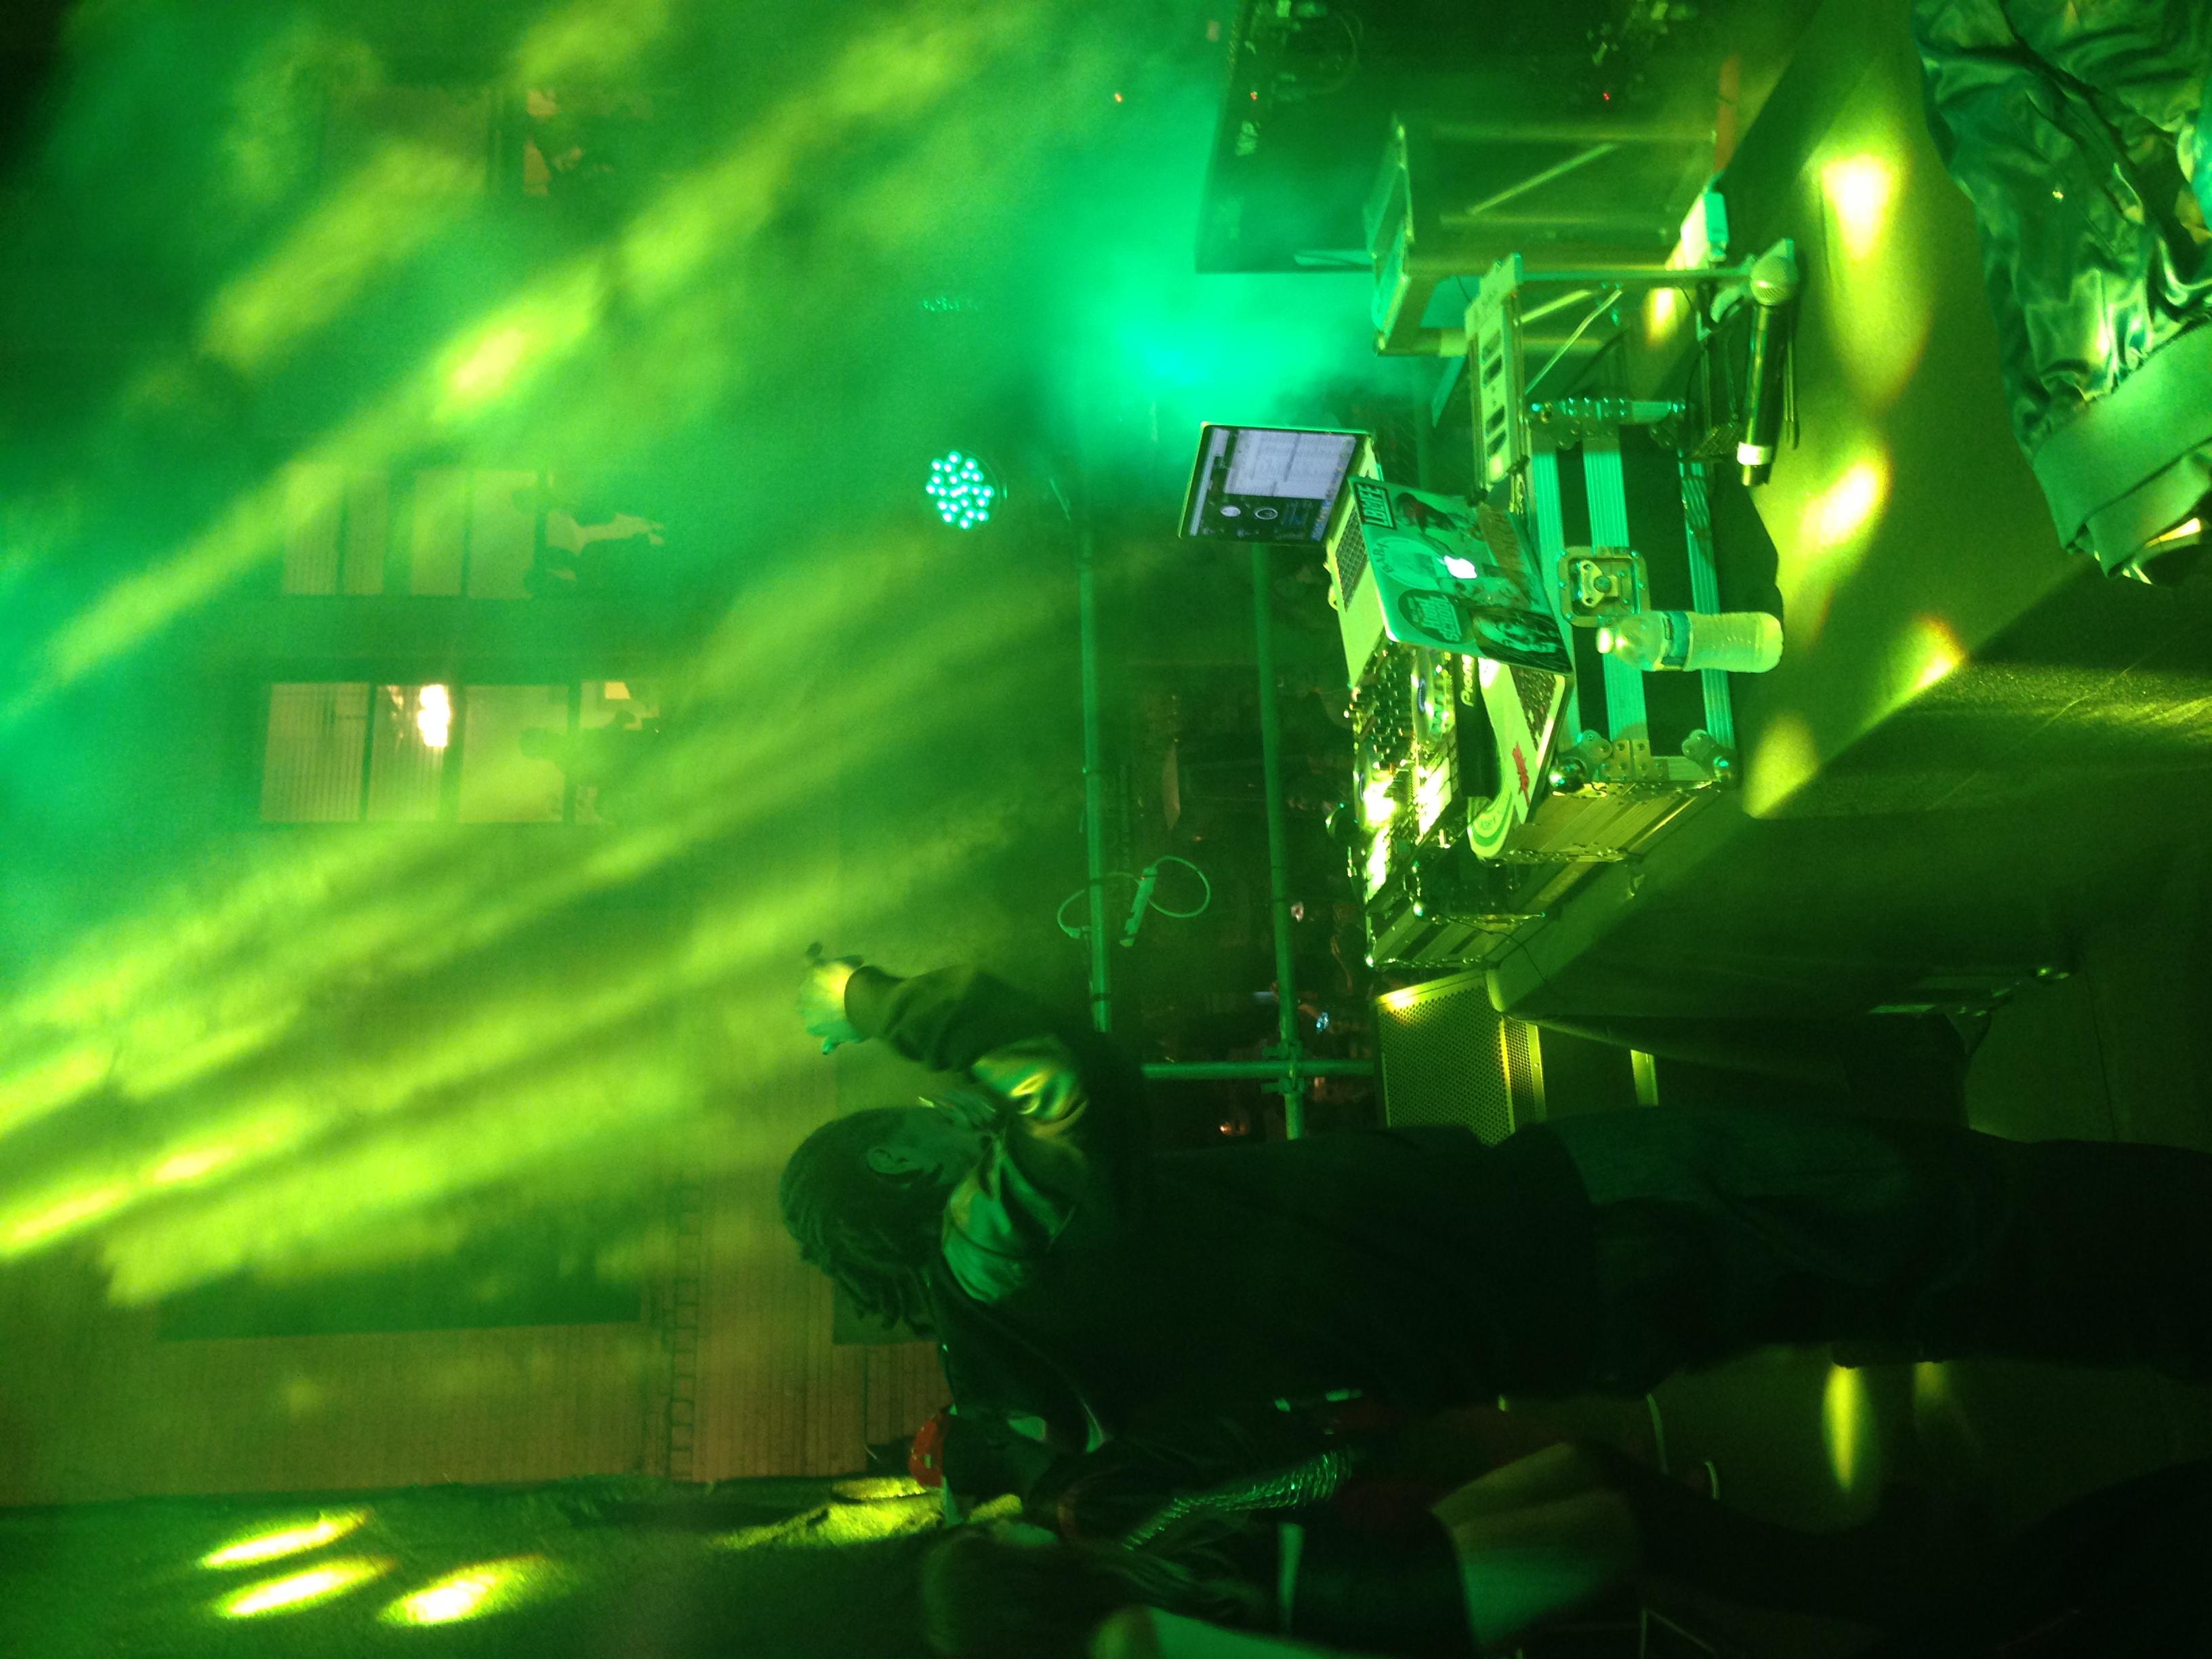 #NEW PHOTOS / DJ SNOOPADELIC / SAN DIEGO MADI GRAS / MARCH 3, 2014